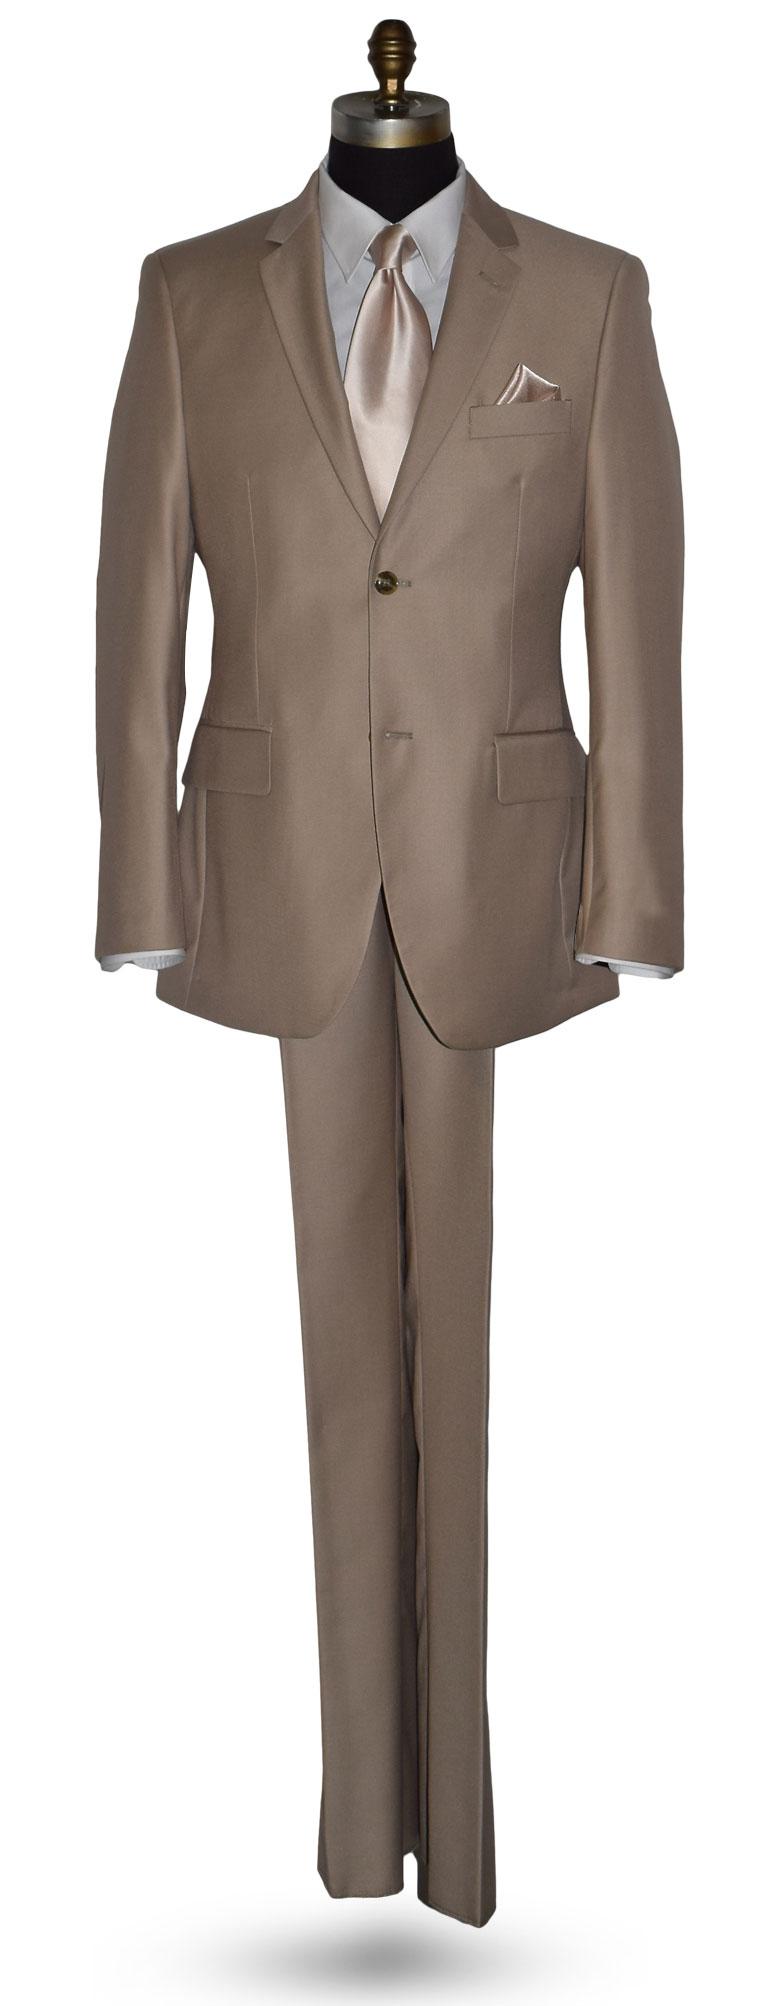 Tan Suit 3 Piece